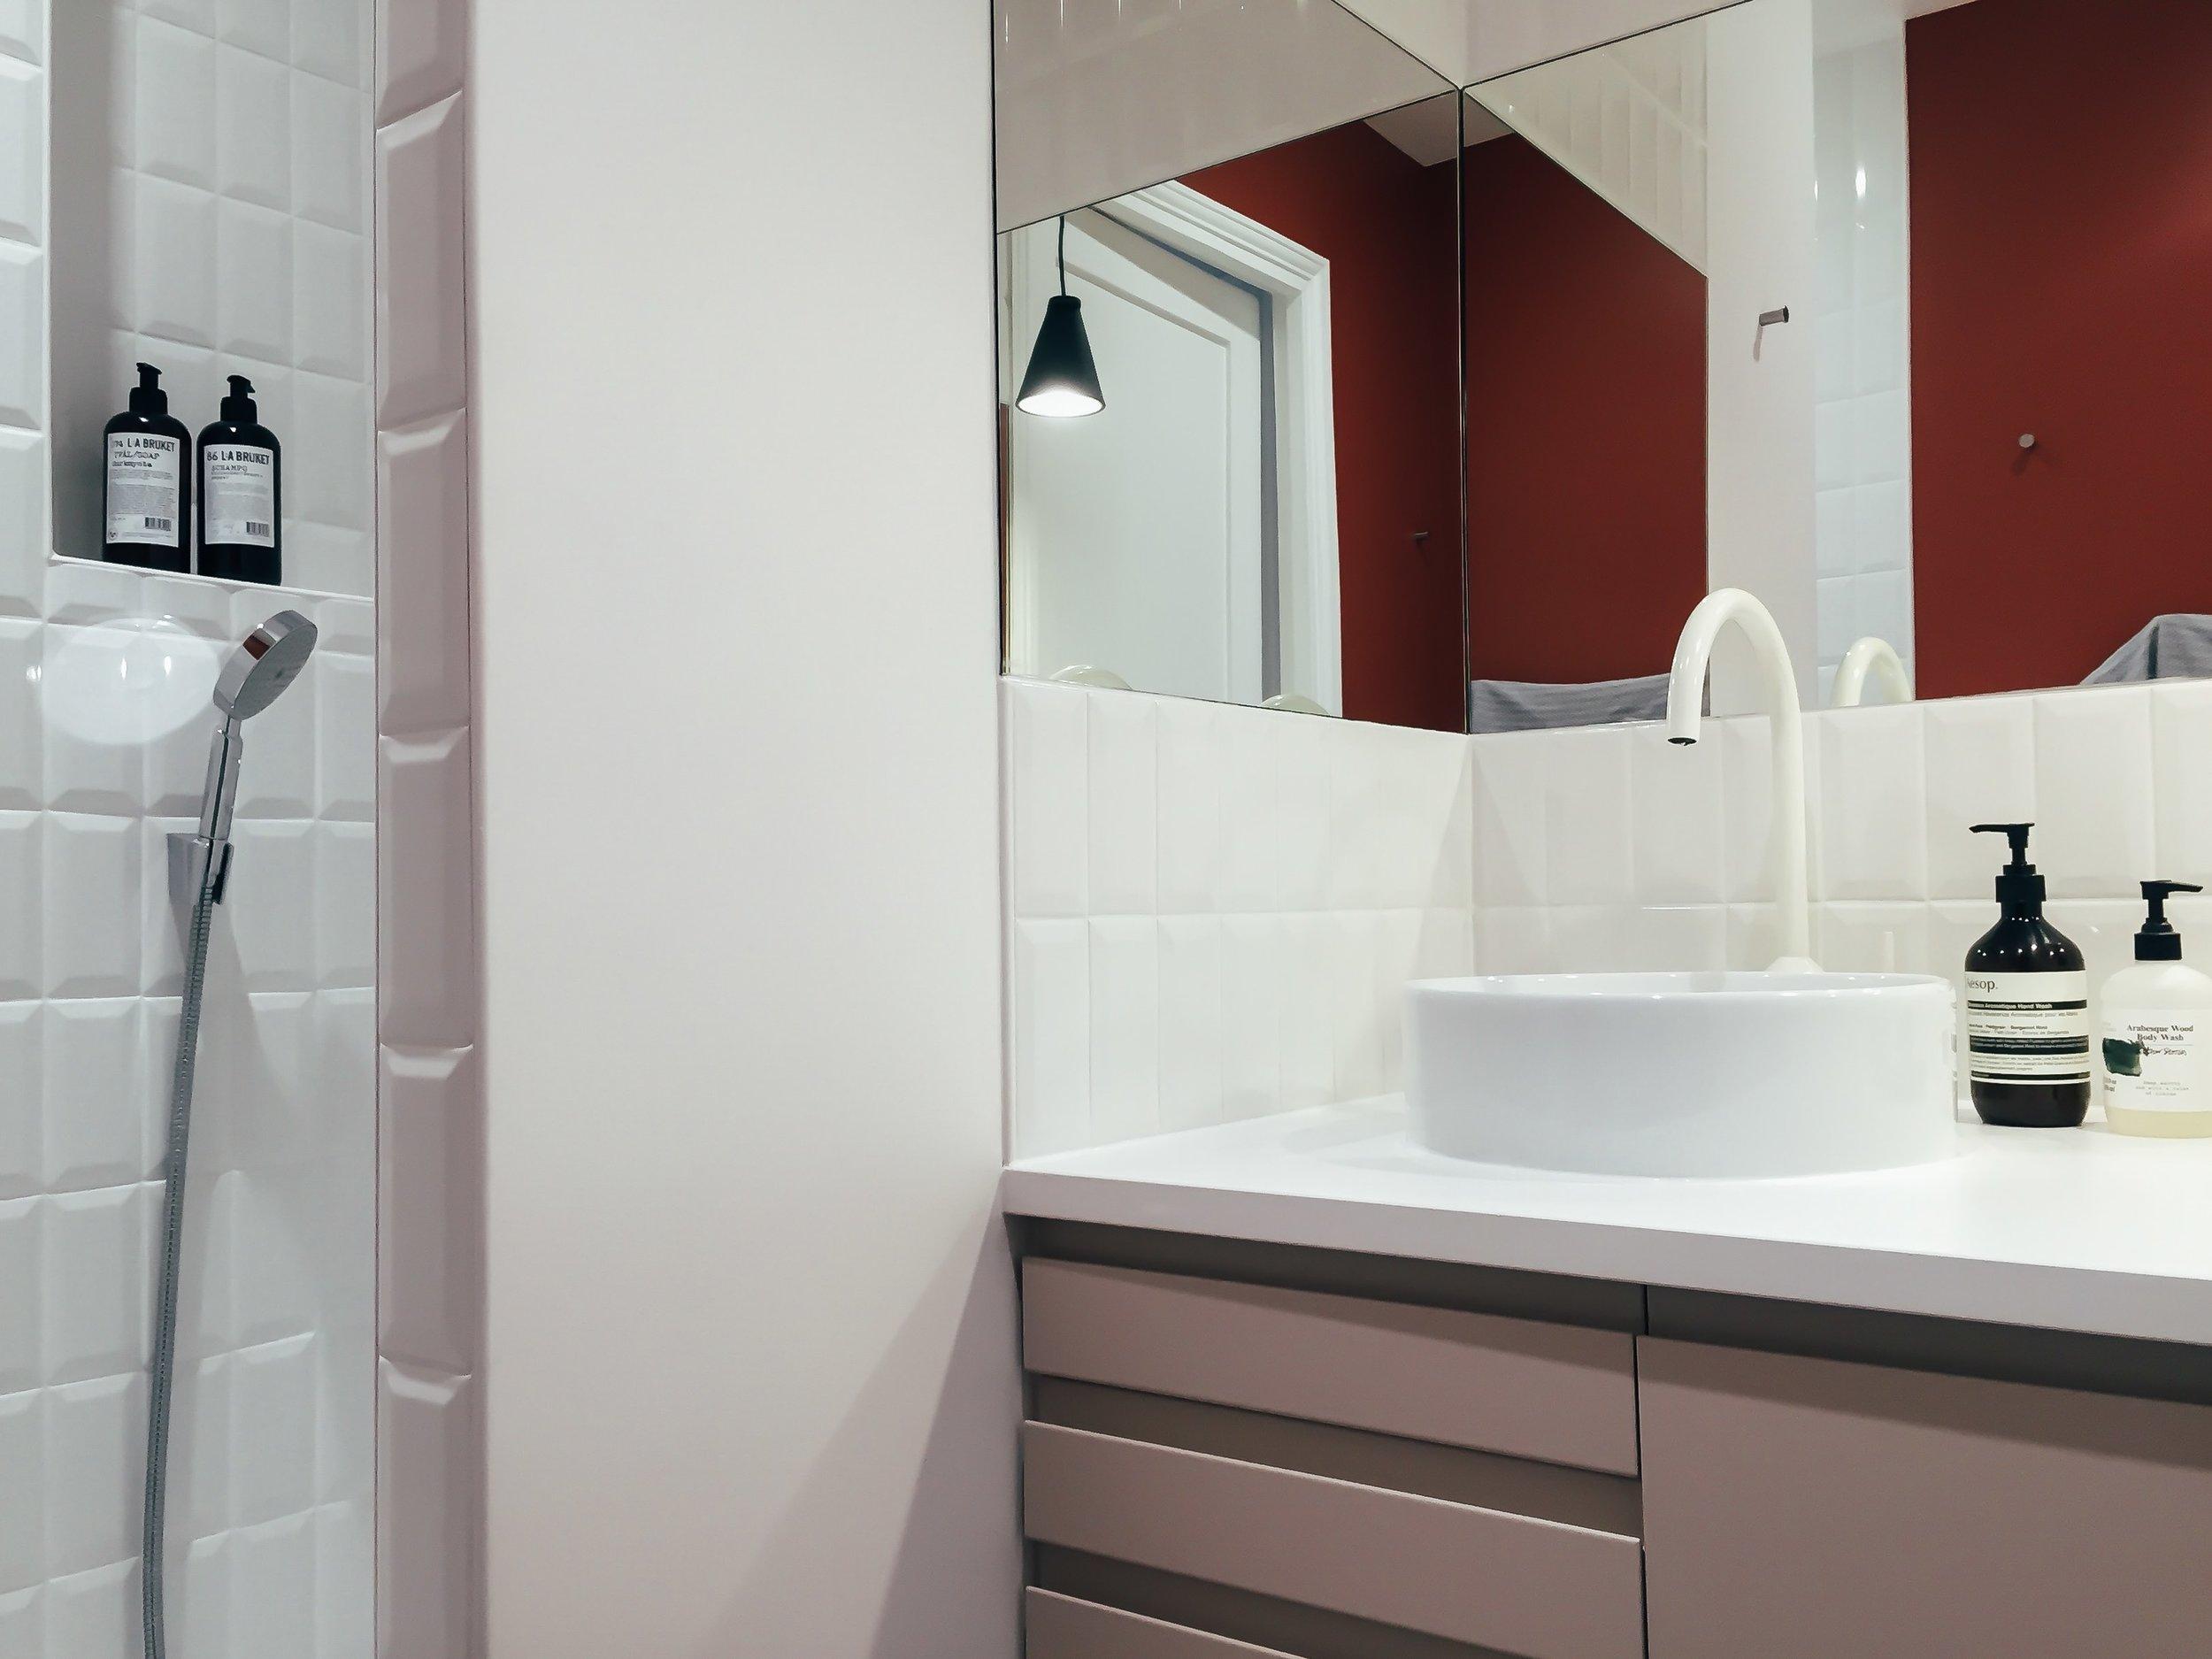 architecte-interieur-paris-terregrise-balard-14.jpg